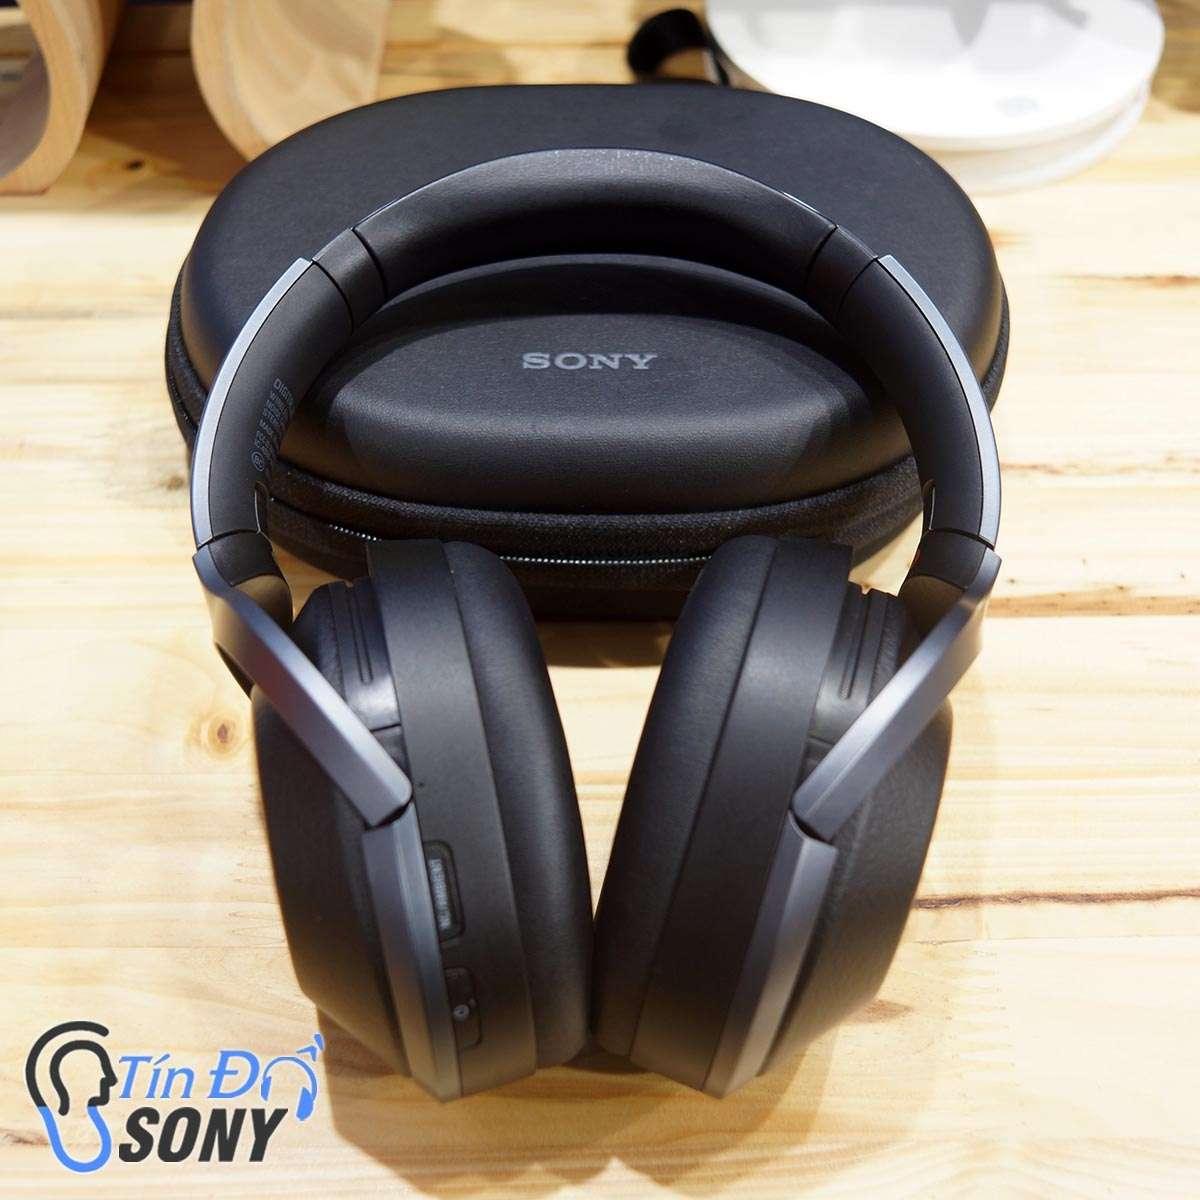 Sony WH-1000XM2 (Like New Ko Box)